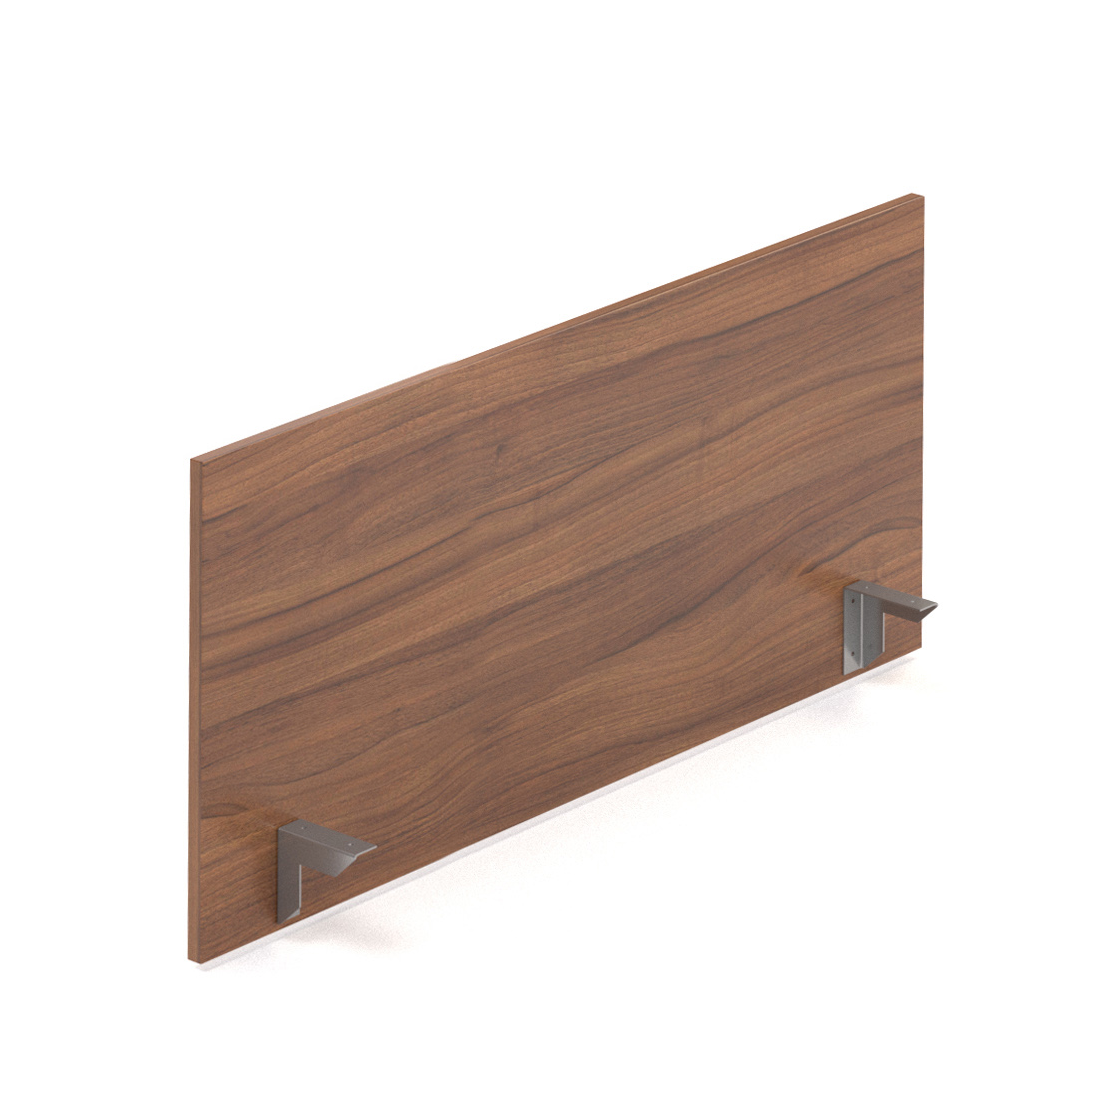 Deliaci panel Komfort 120x49 cm - PD12 19